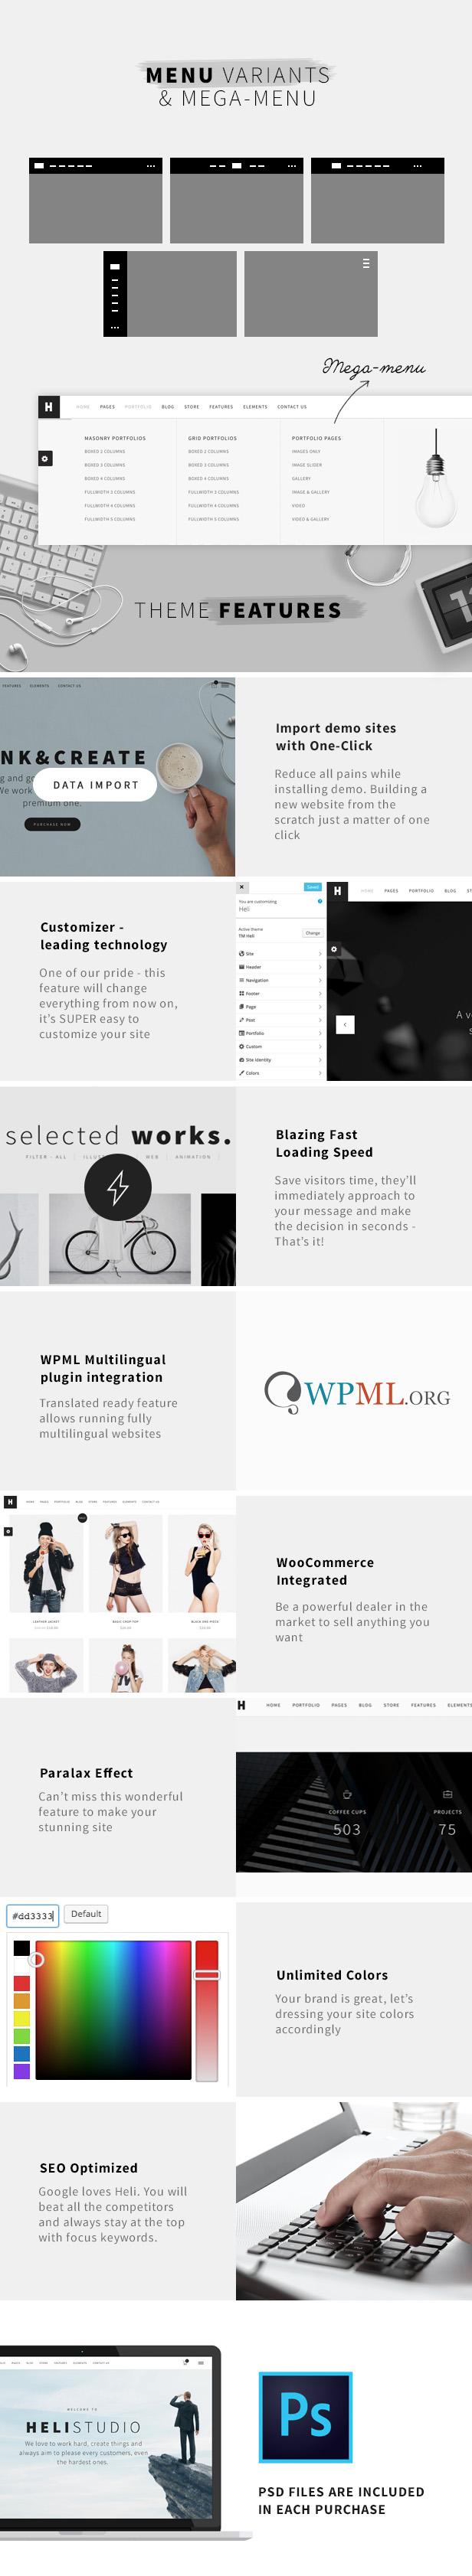 1622292823 835 13 - Heli - Minimal Creative Black and White WordPress Theme